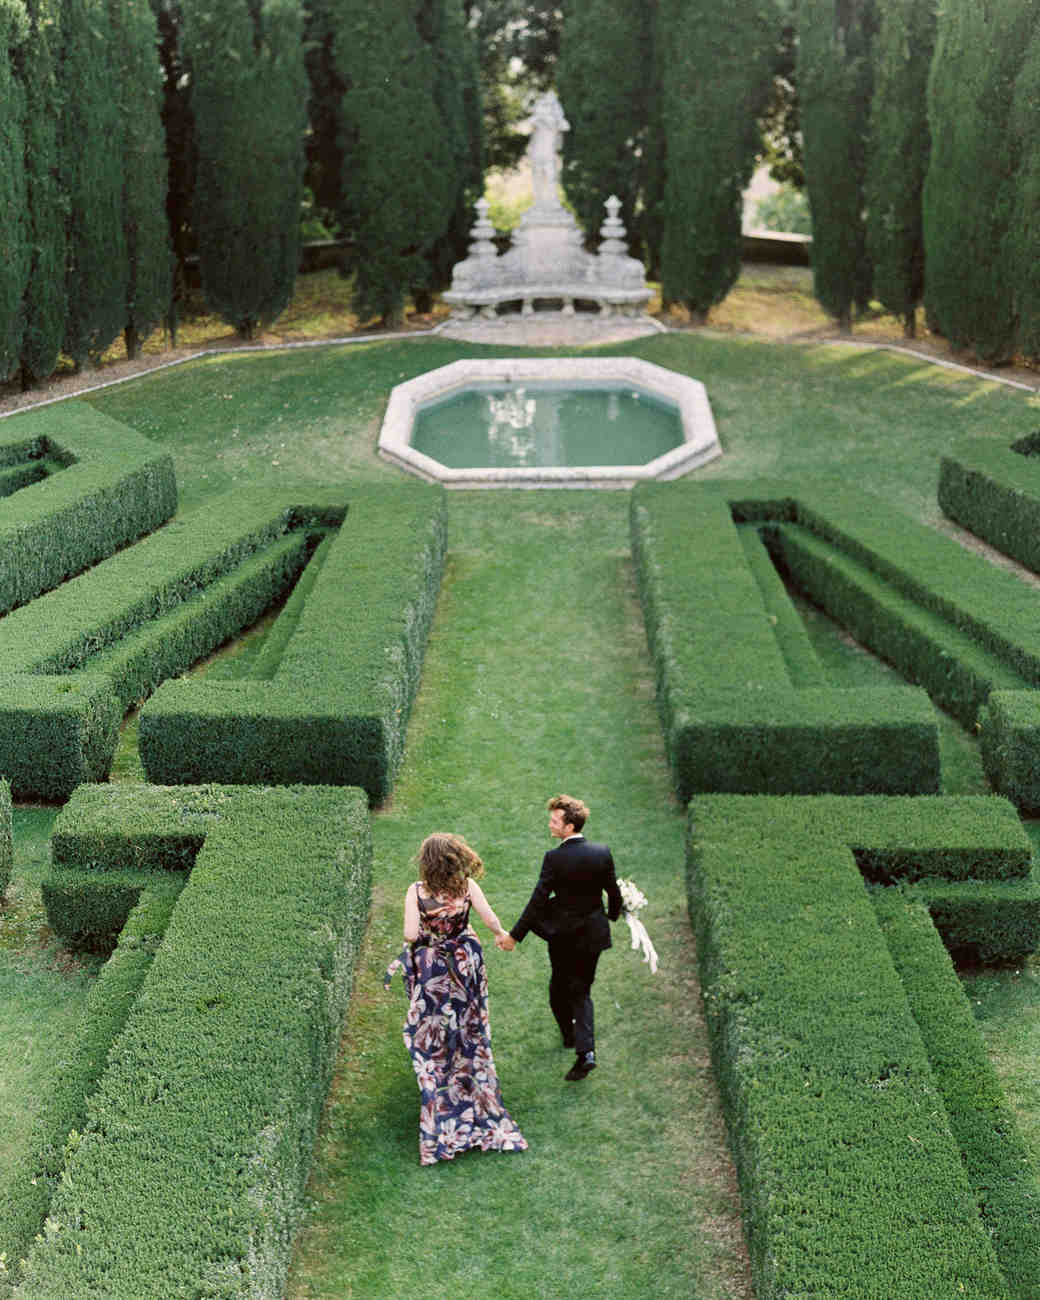 christine-dagan-wedding-couple-gardens-4302_13-s113011-0616.jpg